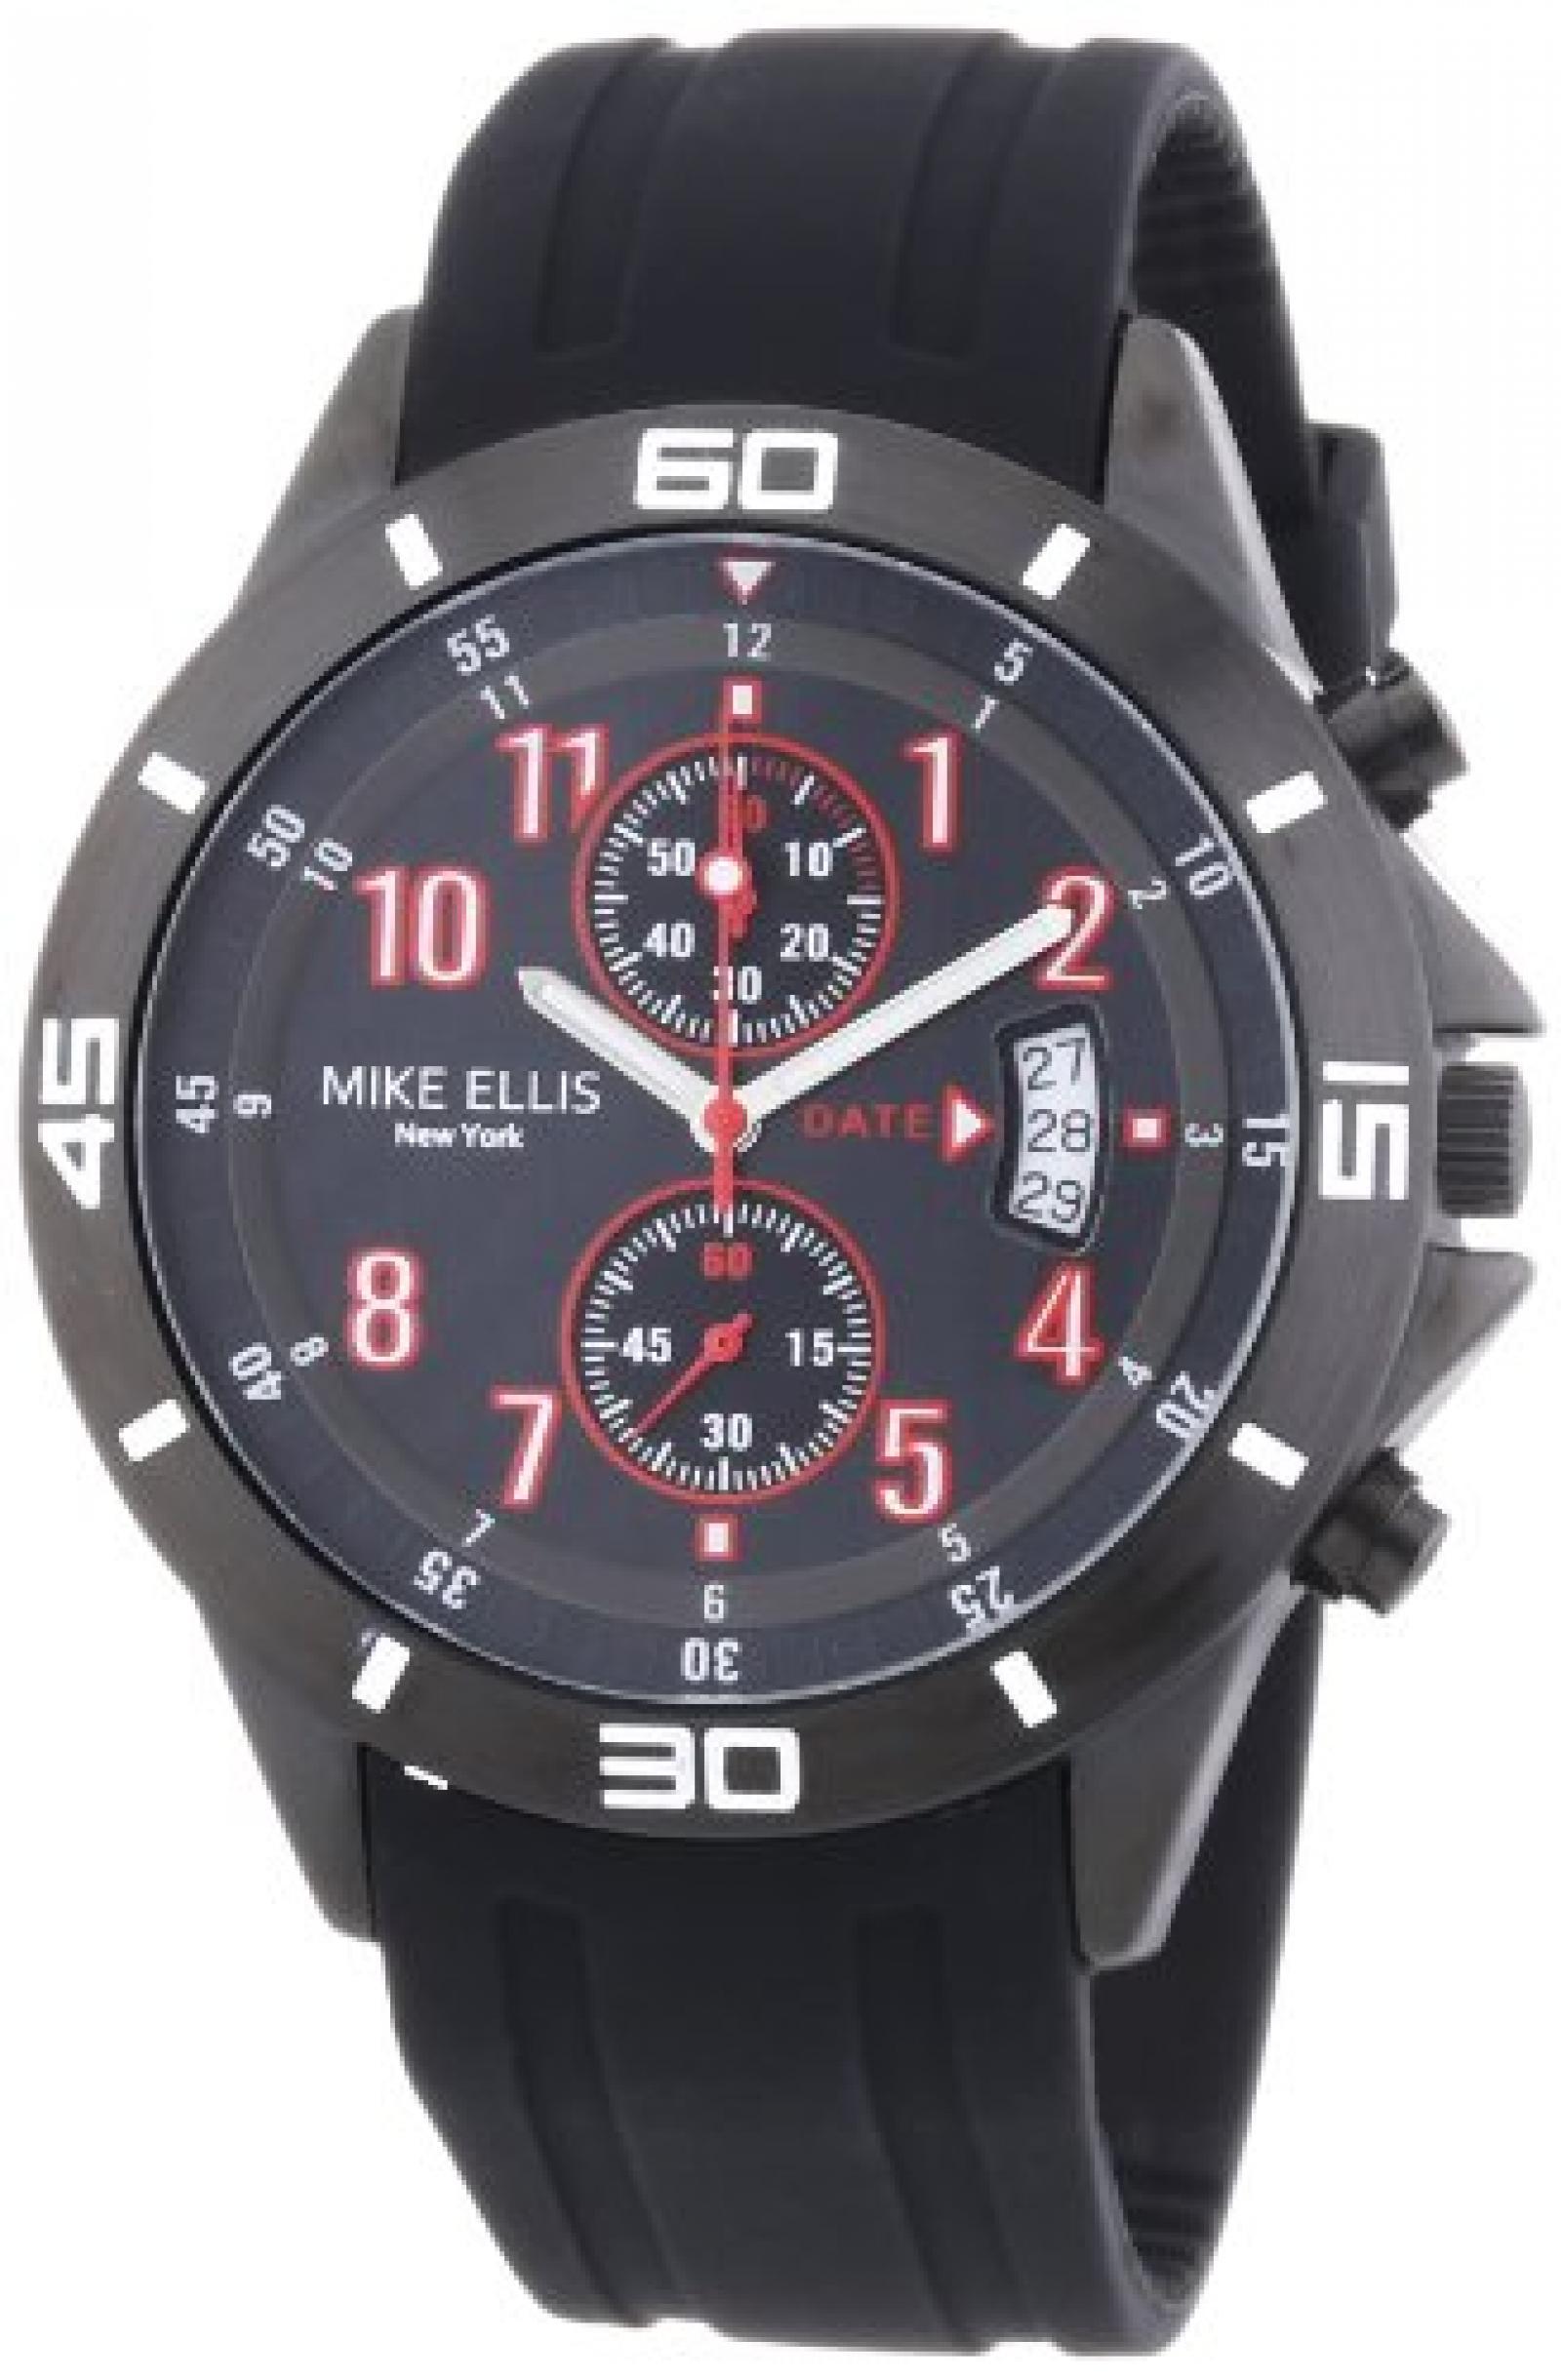 Mike Ellis New York Herren-Armbanduhr XL Analog Quarz Silikon M3096/1